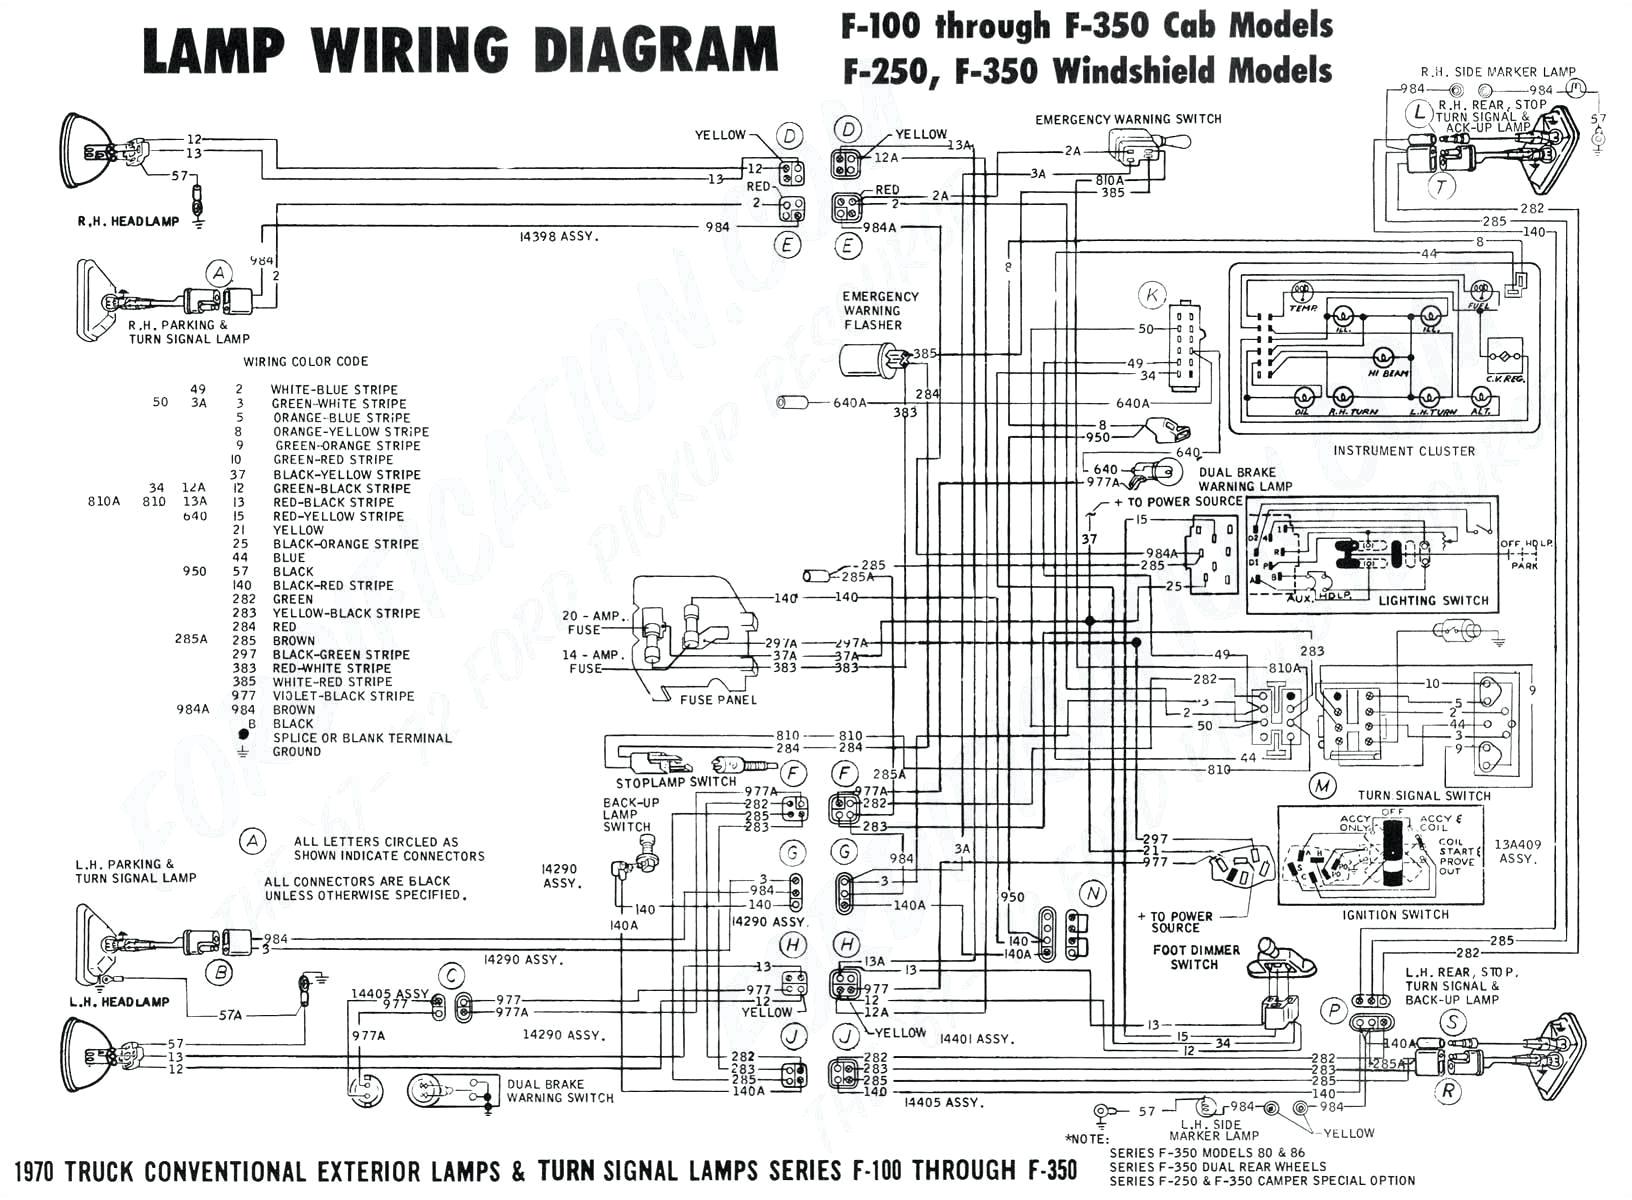 velvac mirror wiring diagram fuse box diagram ford truck enthusiasts forums autos weblog wire rh javastraat co velvac gas cap velvac rv mirror wiring diagram 2d jpg